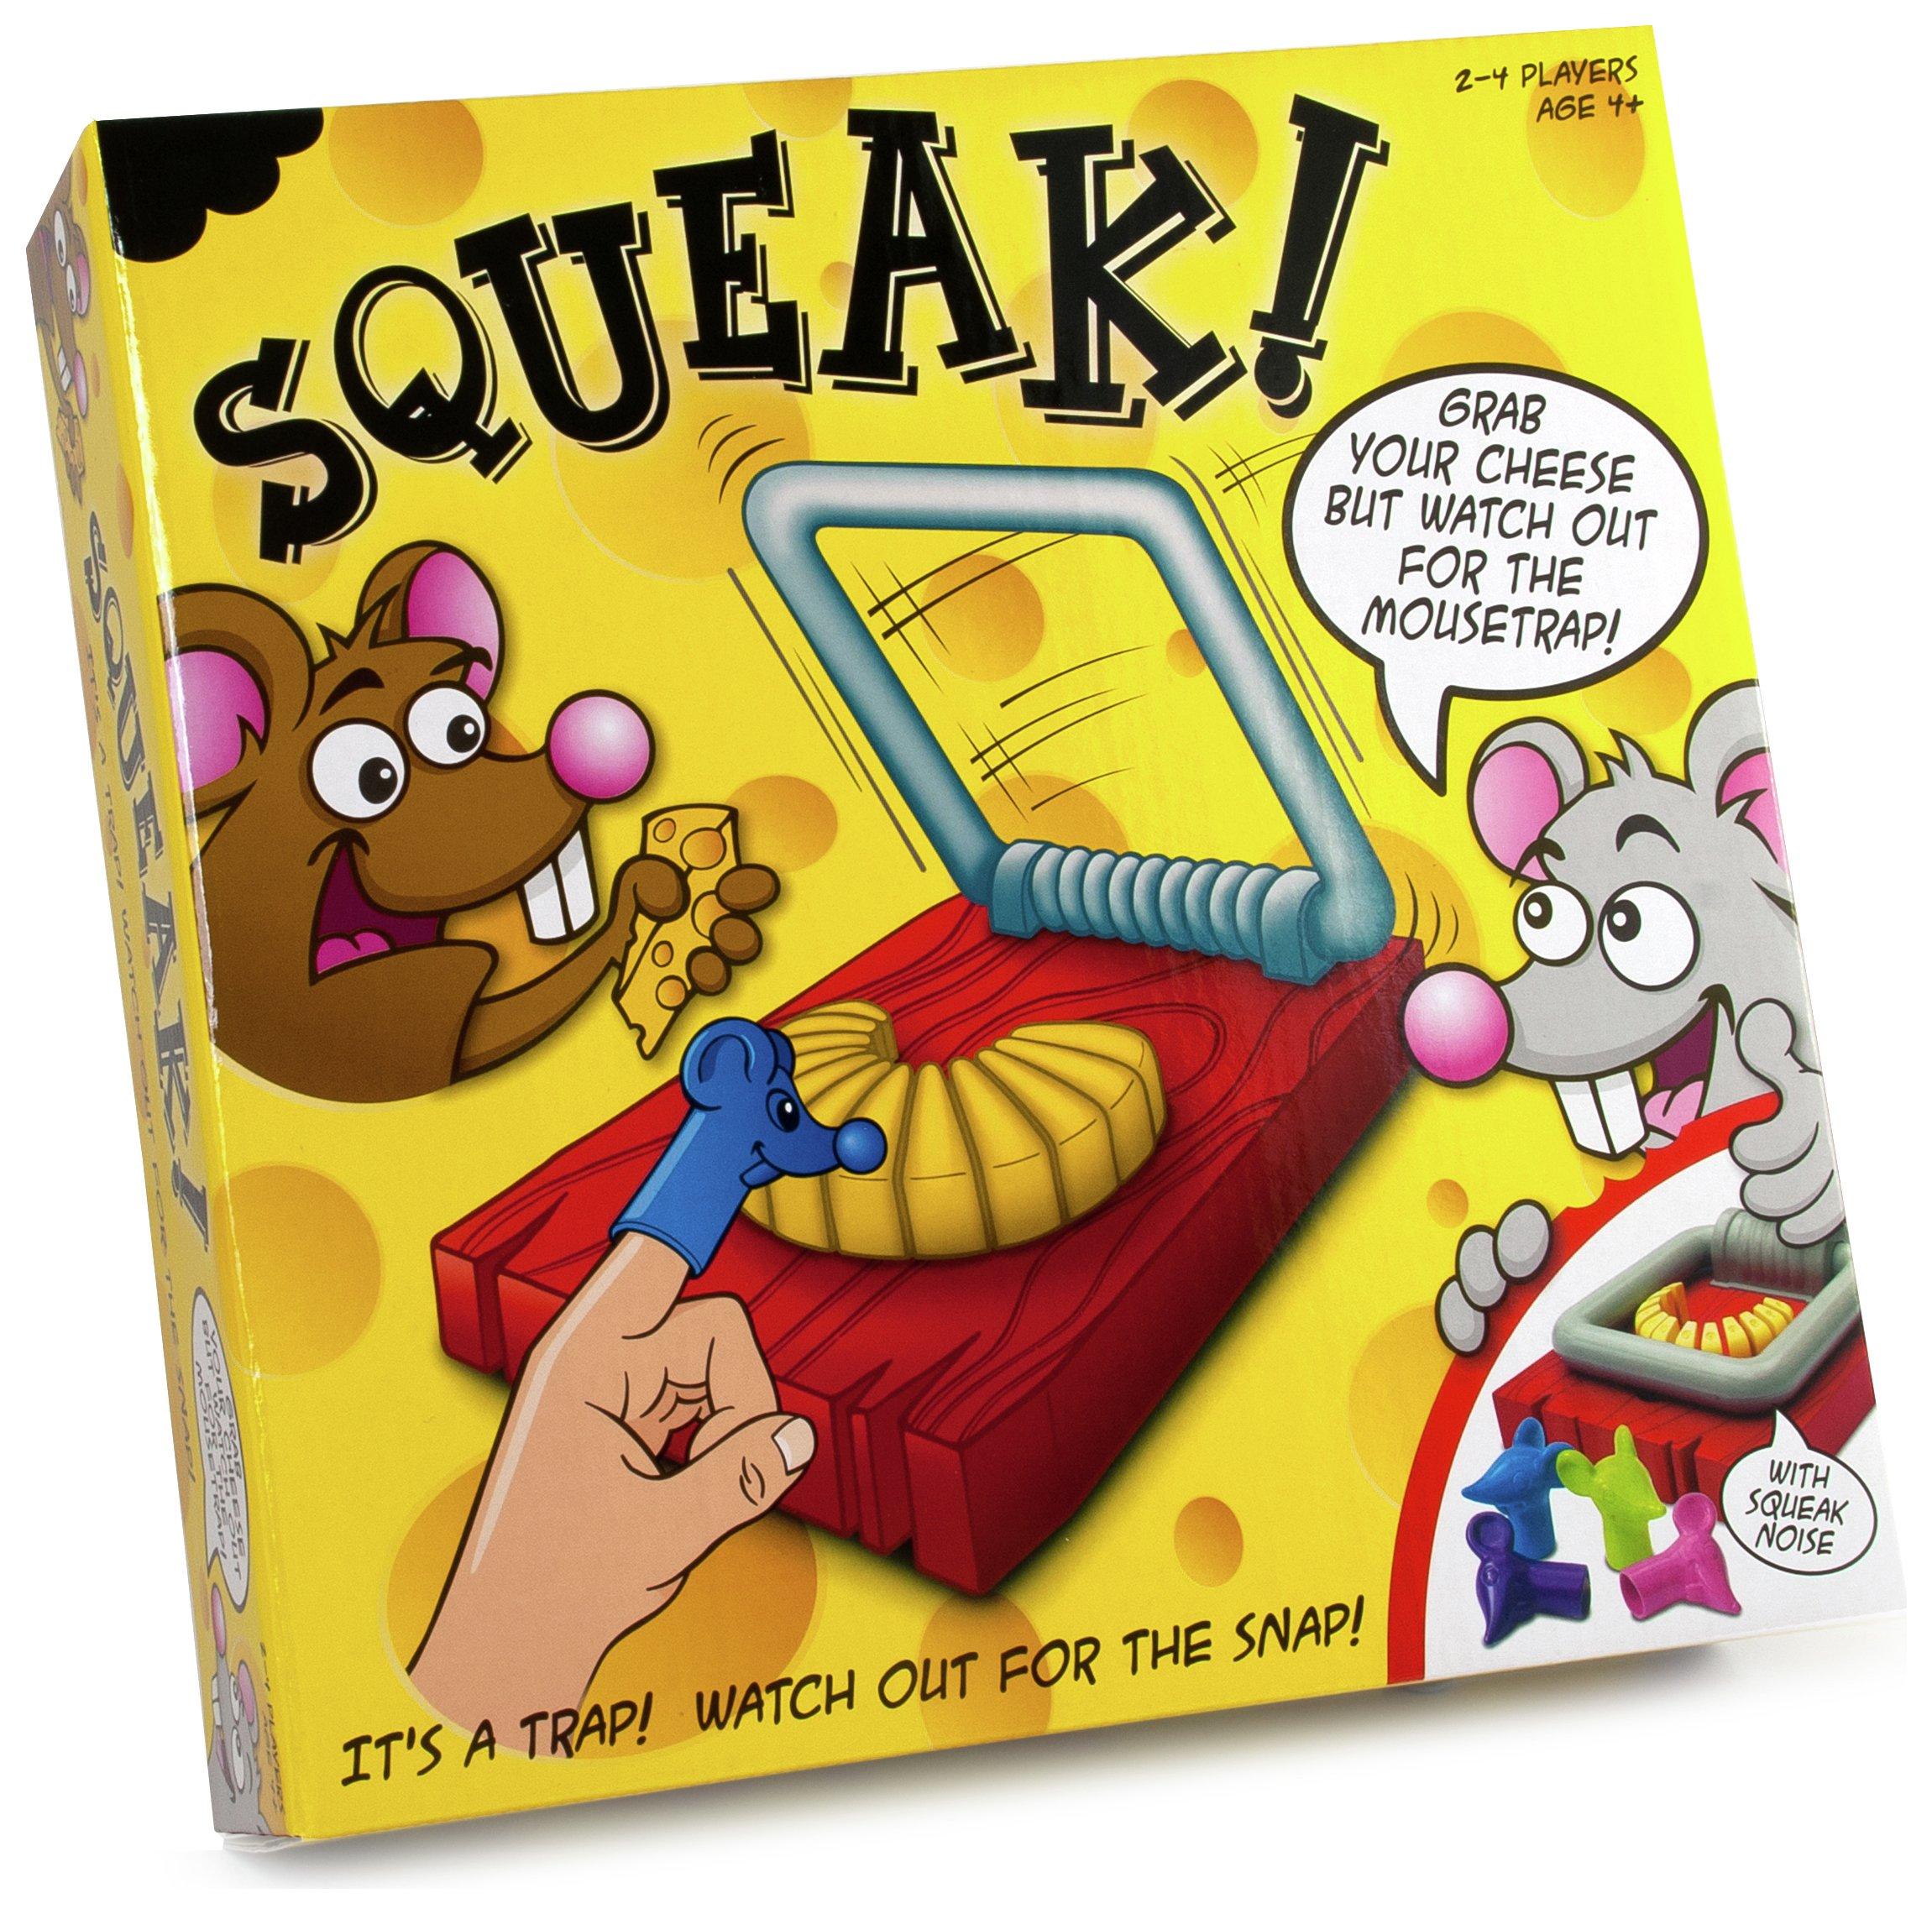 Image of Paul Lamond Games Squeak Game.